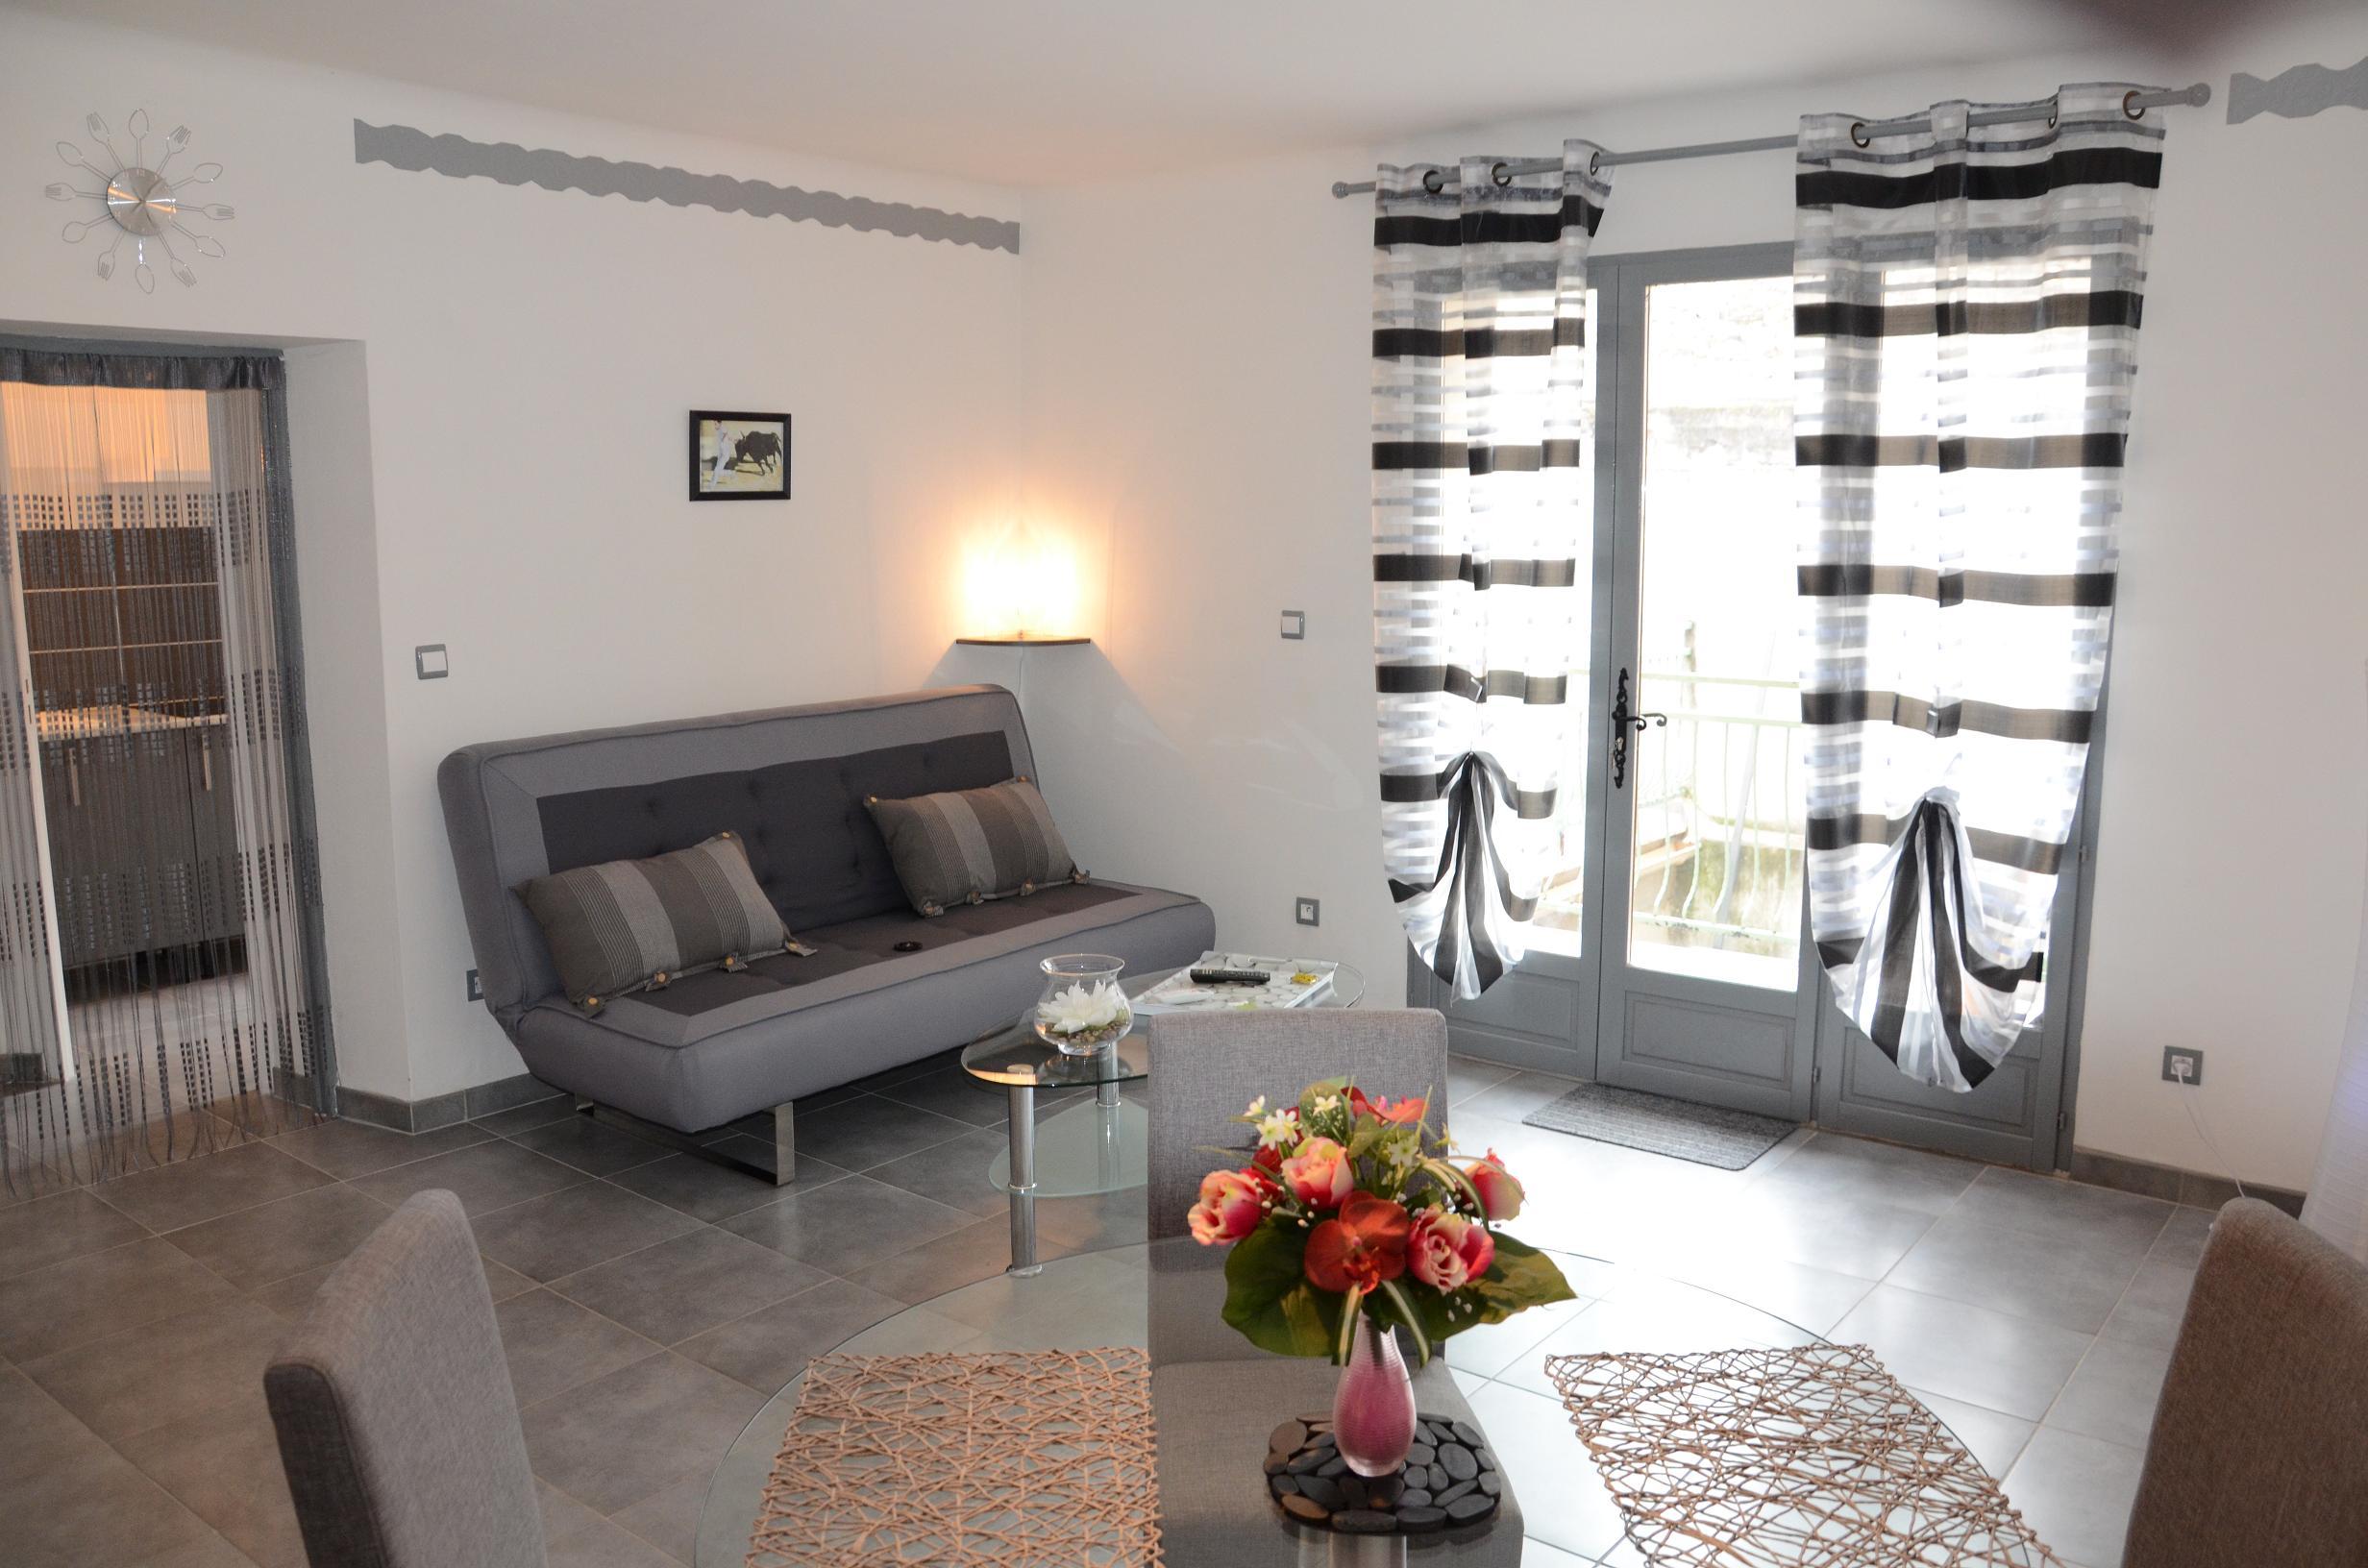 appart-location-tarascon-beaucaire-provence-la-maison-olivier